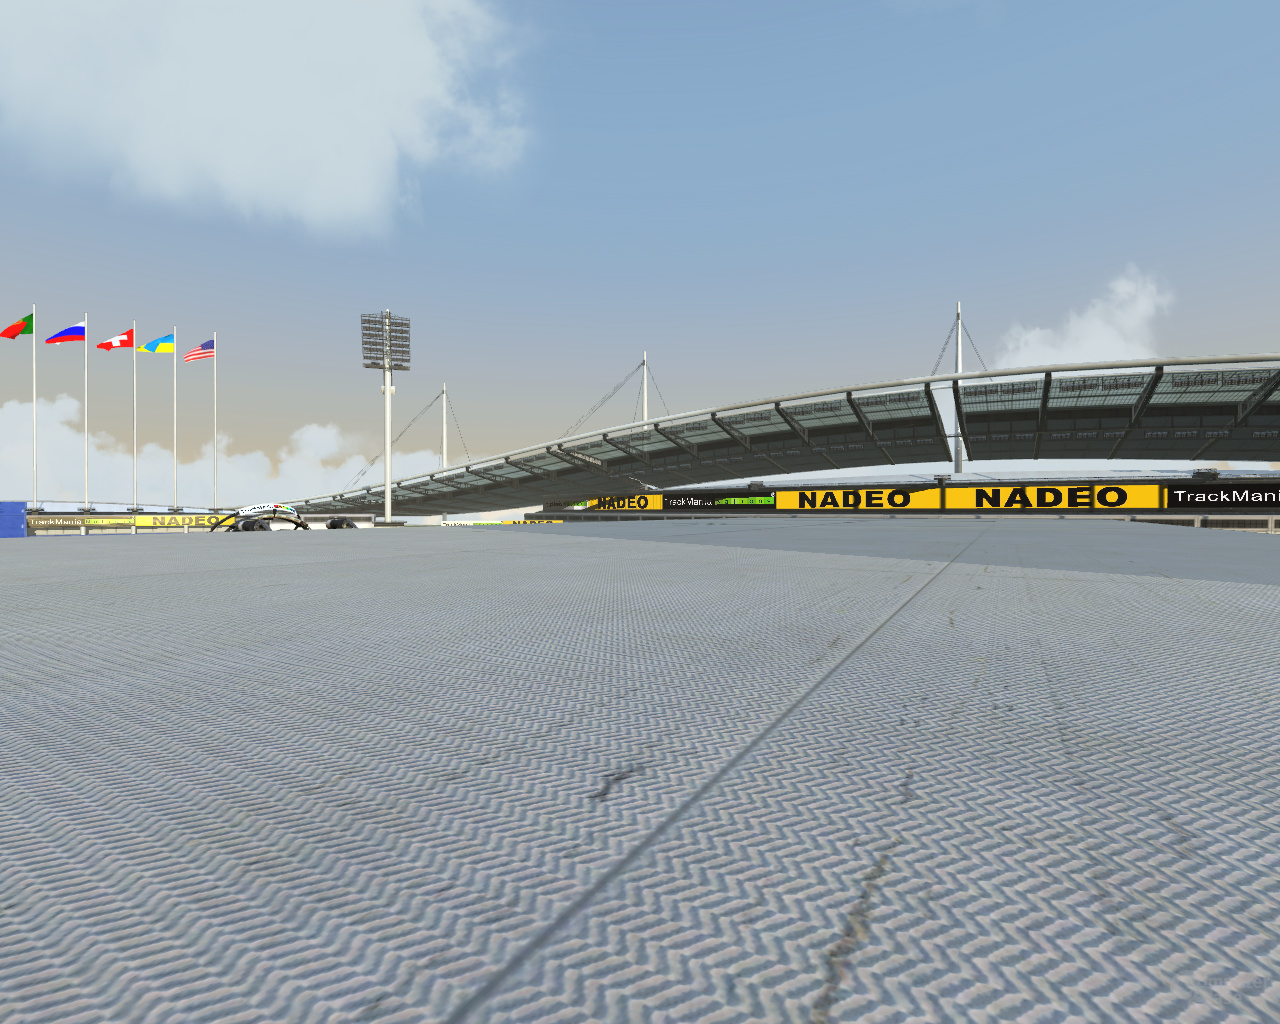 Nvidia GF100 Trackmania - 16xHQAF